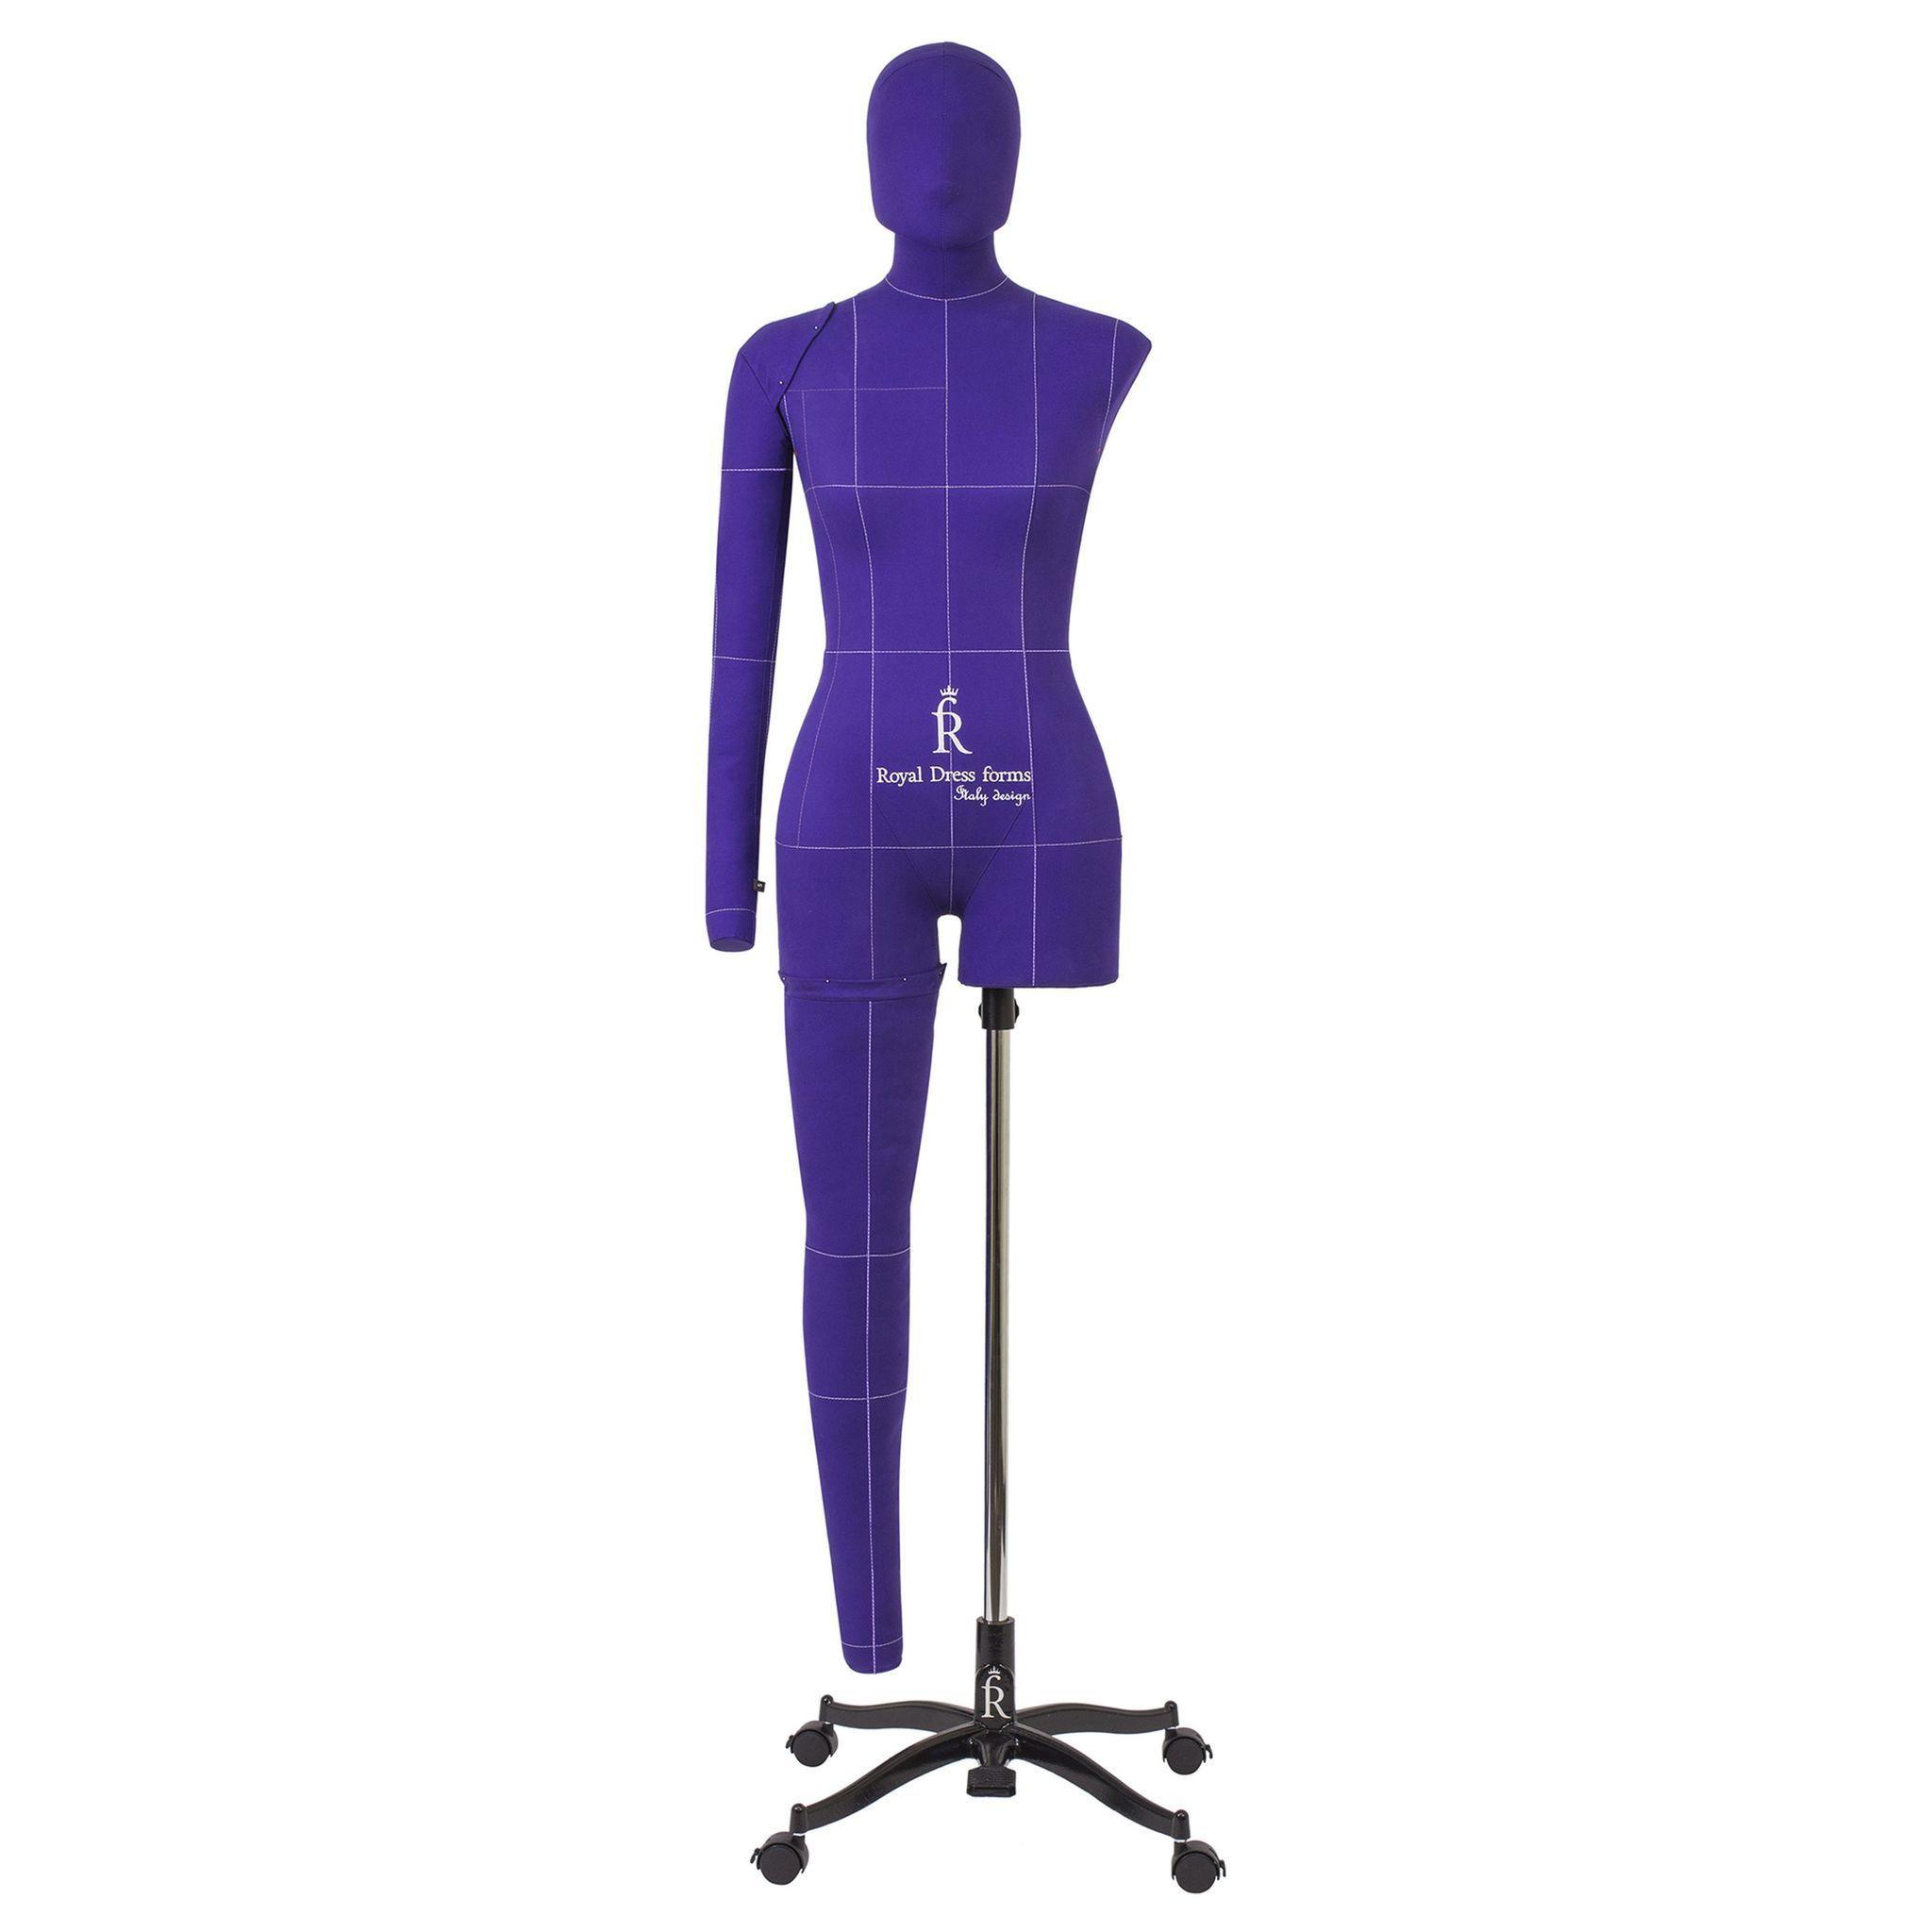 Манекен портновский Моника, комплект Арт, размер 46, ФиолетовыйФото 3